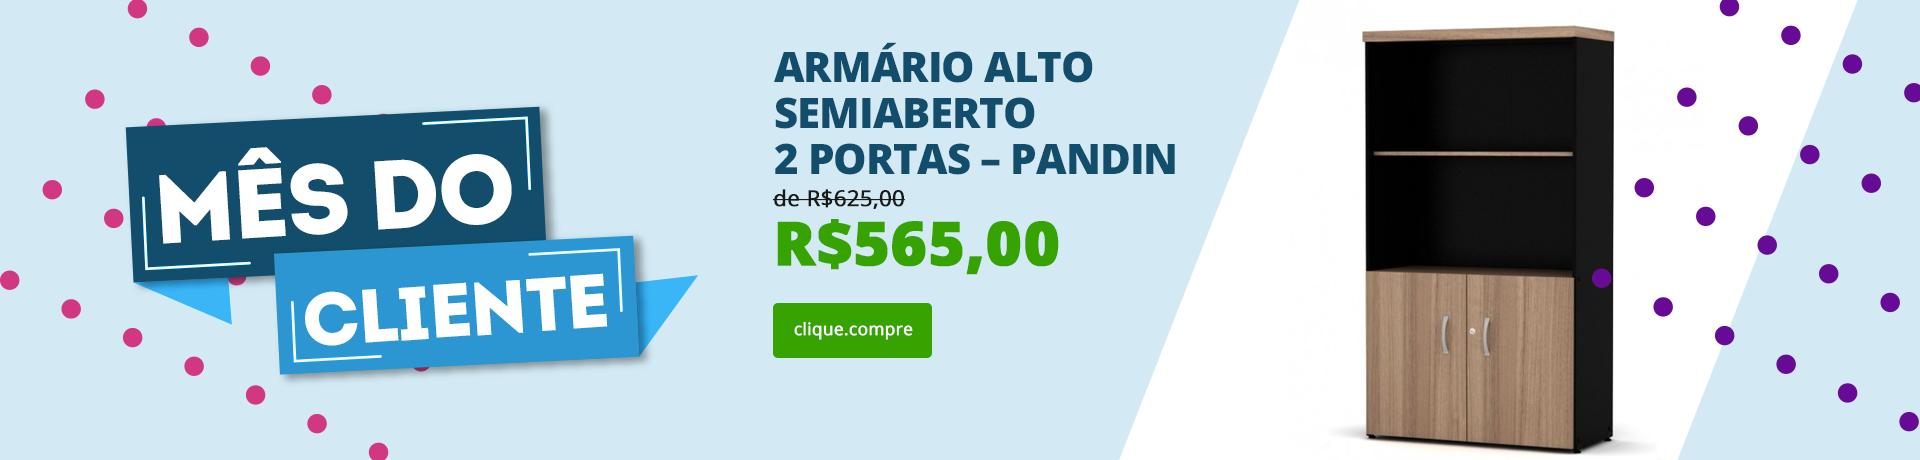 Armário Alto Semiaberto 2 portas – Pandin